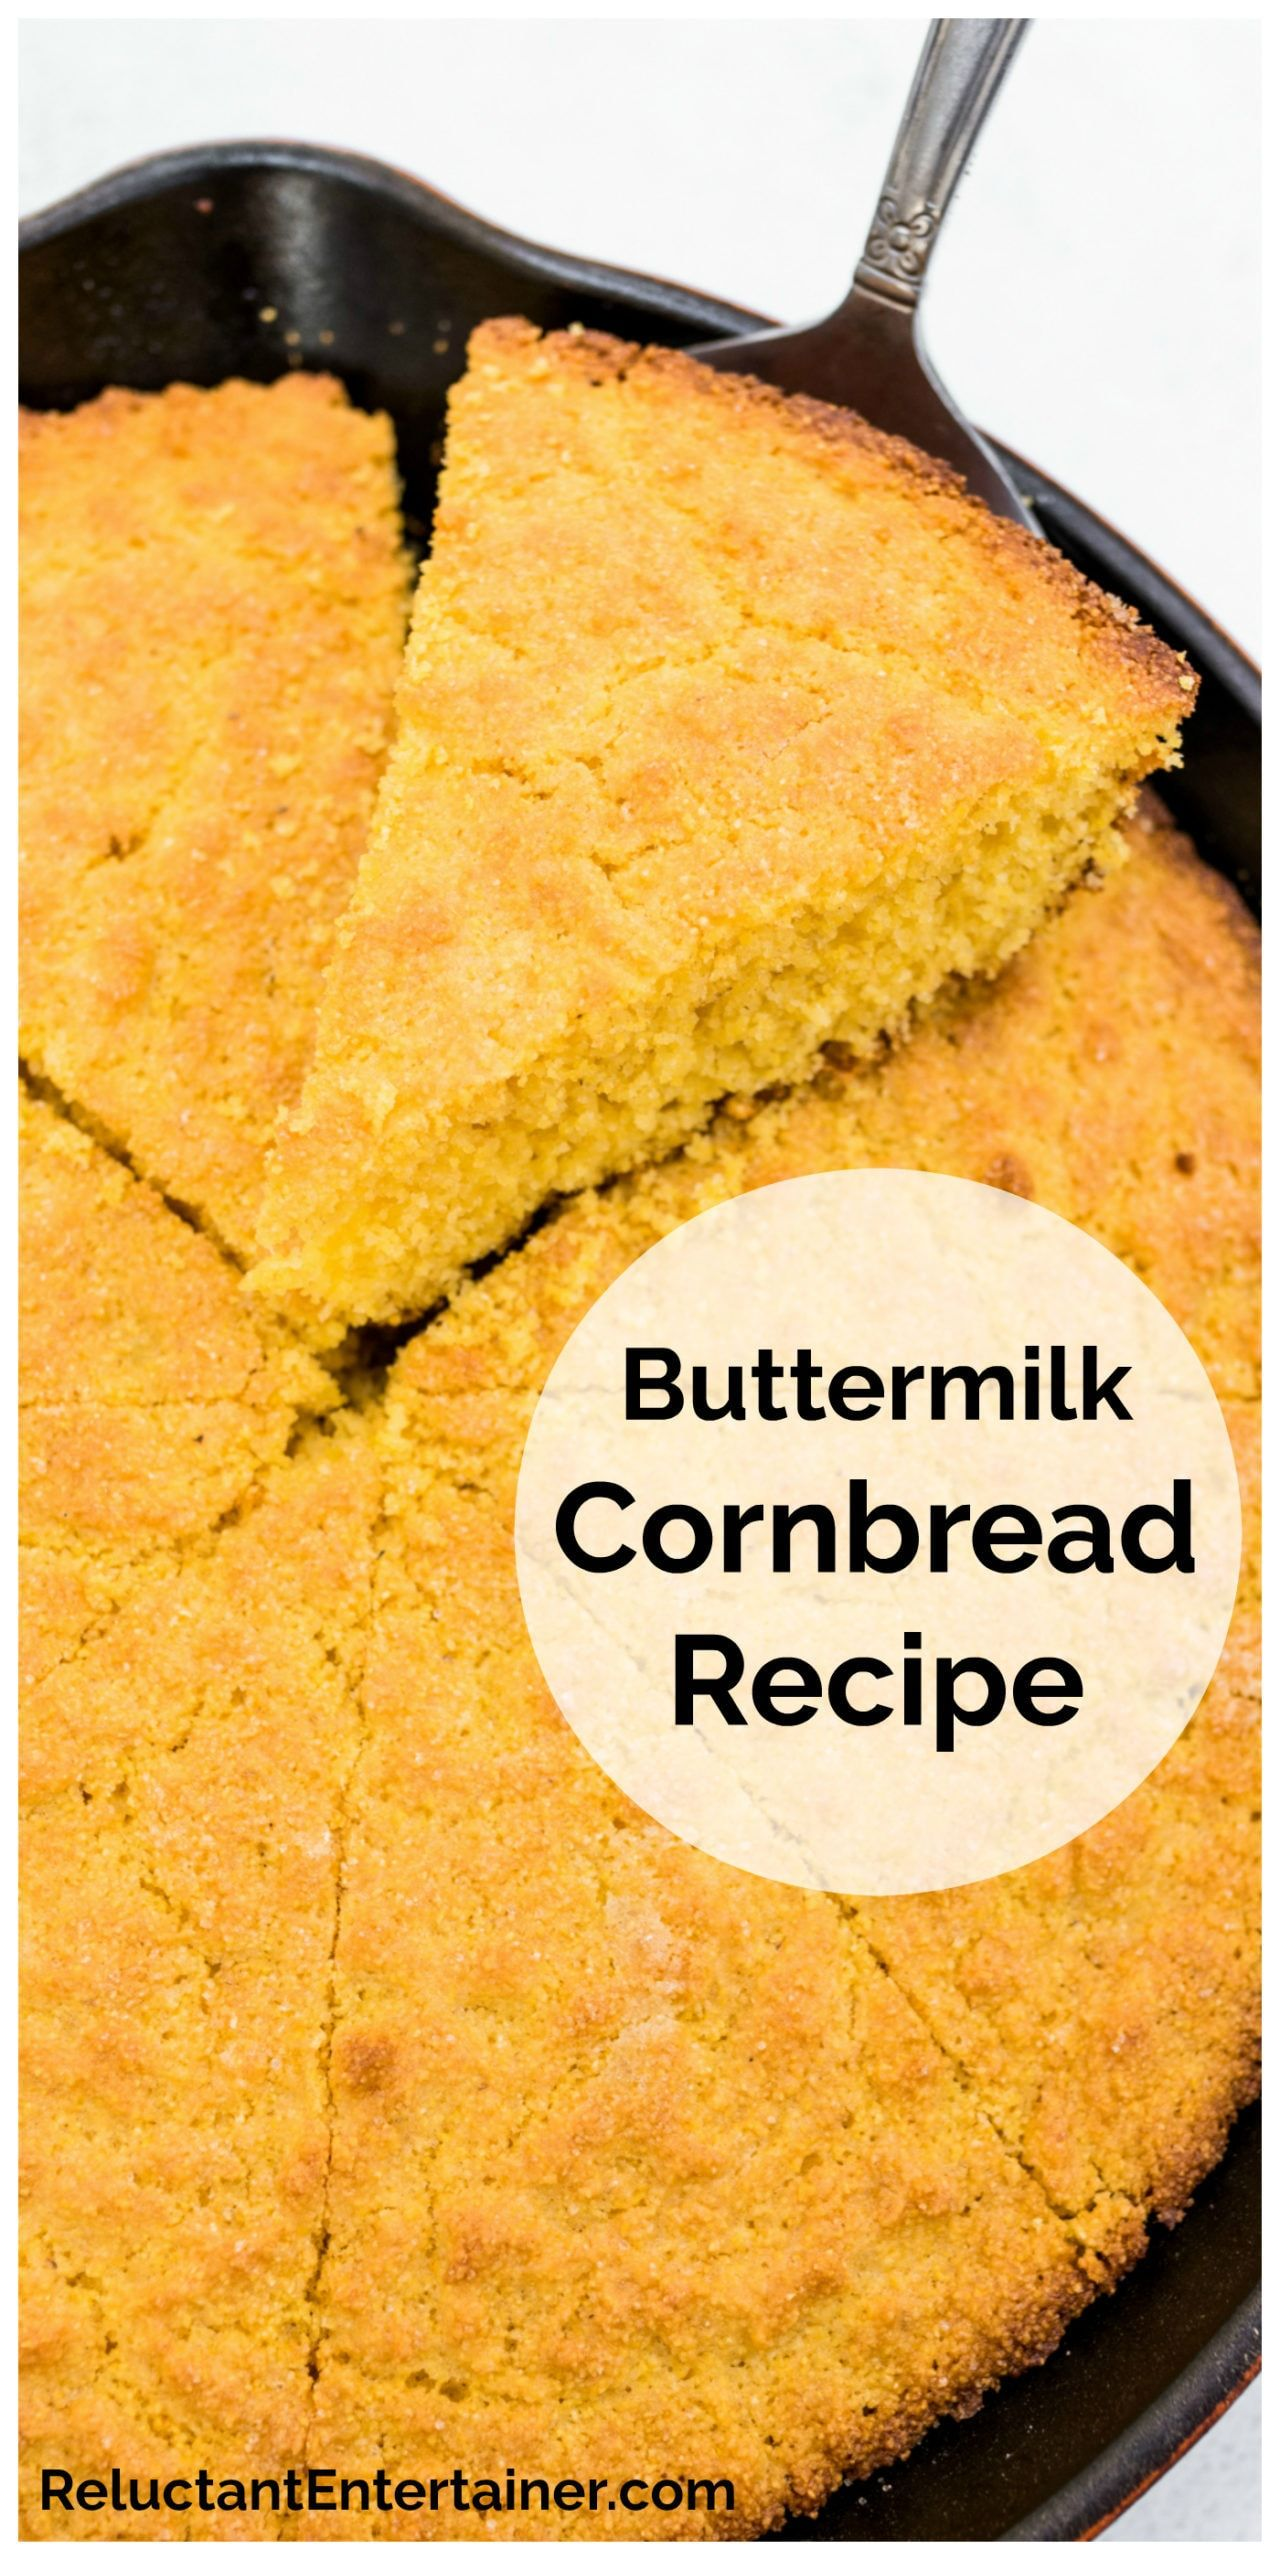 Buttermilk Cornbread Recipe In 2020 Recipes Buttermilk Cornbread Corn Bread Recipe